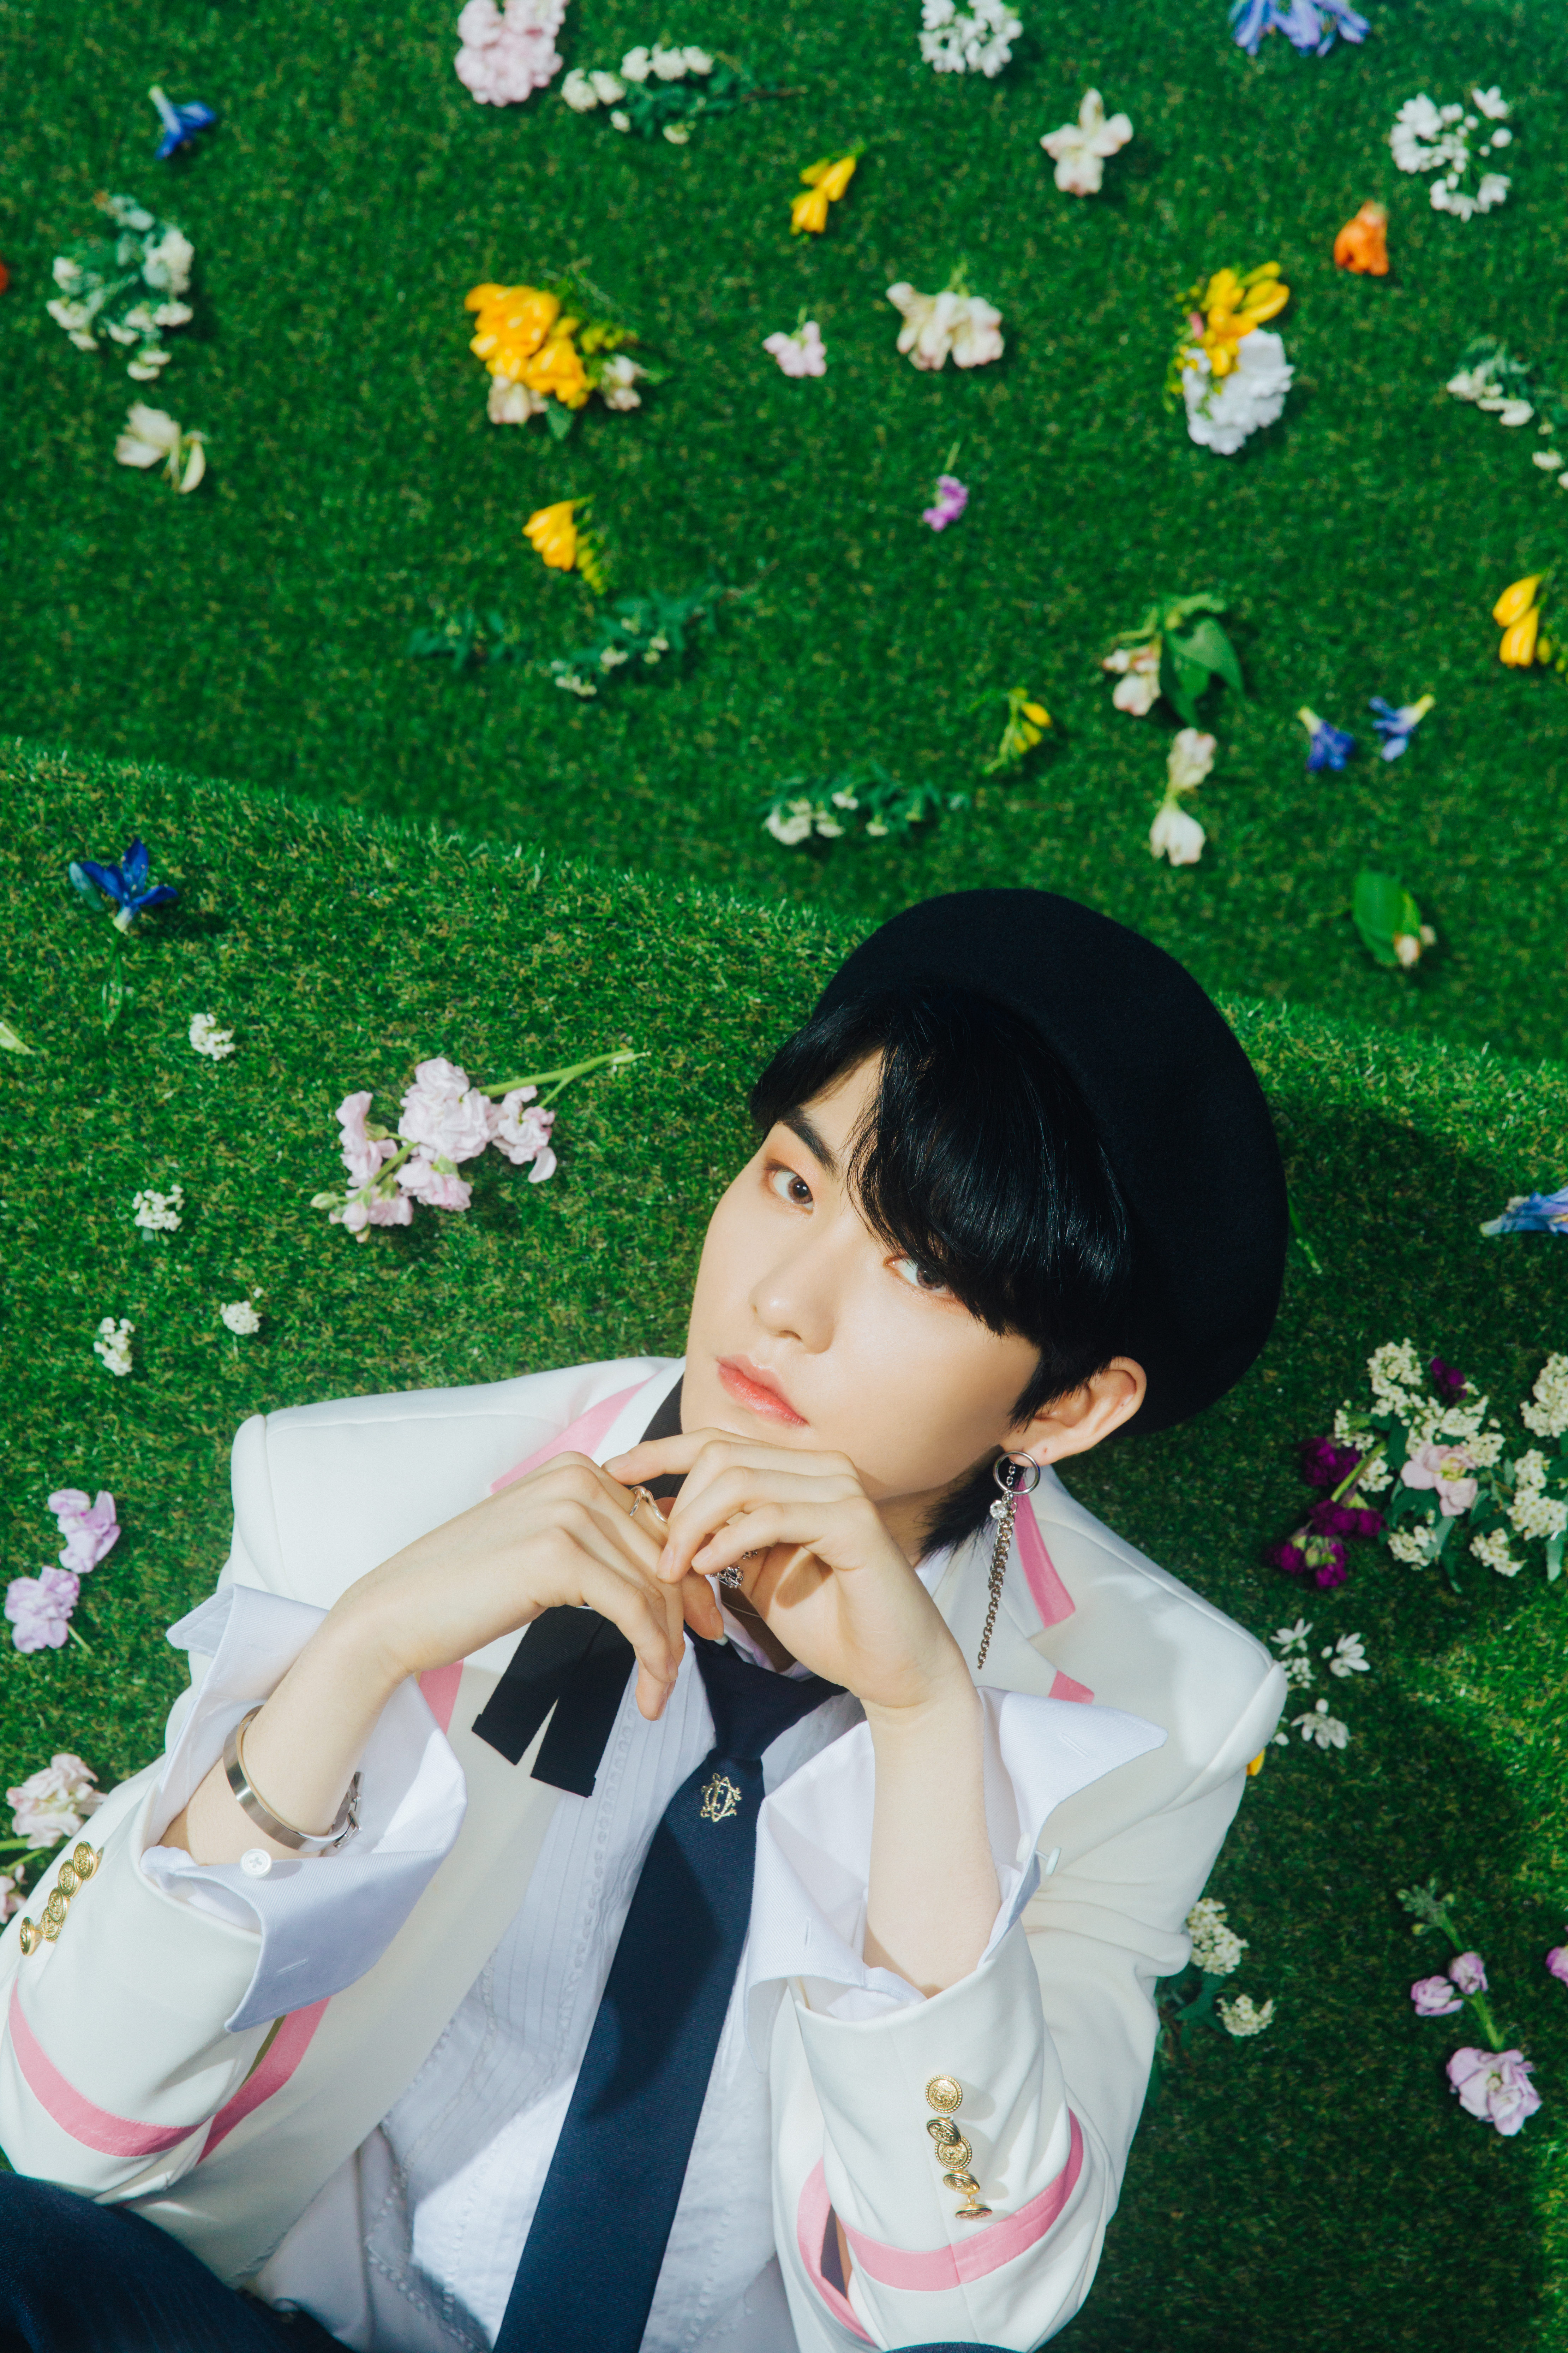 The Boyz Bloom Bloom Concept Photos Hd Hr K Pop Database Dbkpop Com